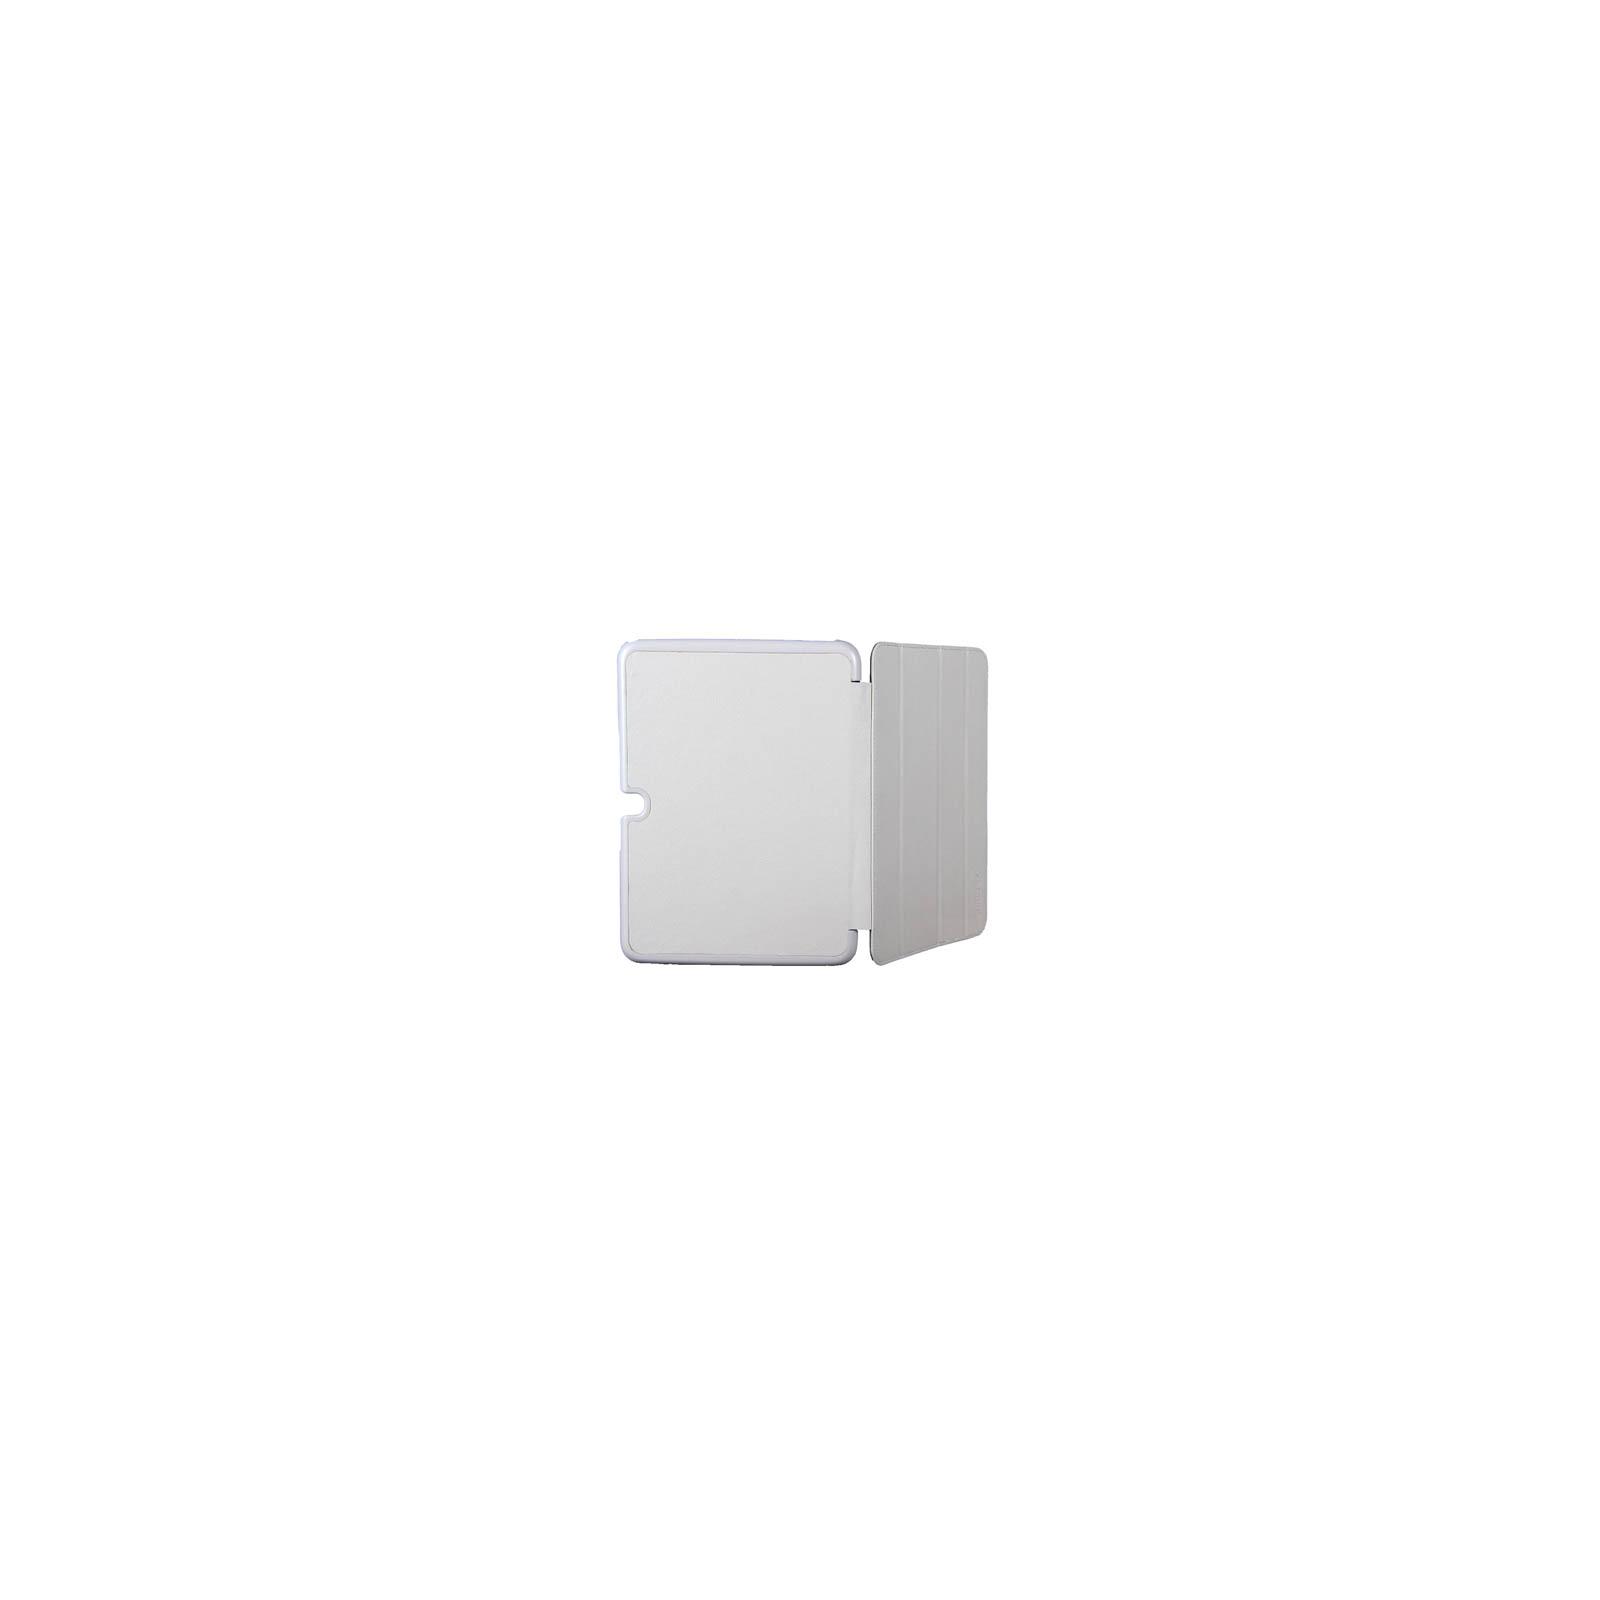 Чехол для планшета SUMDEX 10.1 Samsung Tab3 (ST3-102W) изображение 3